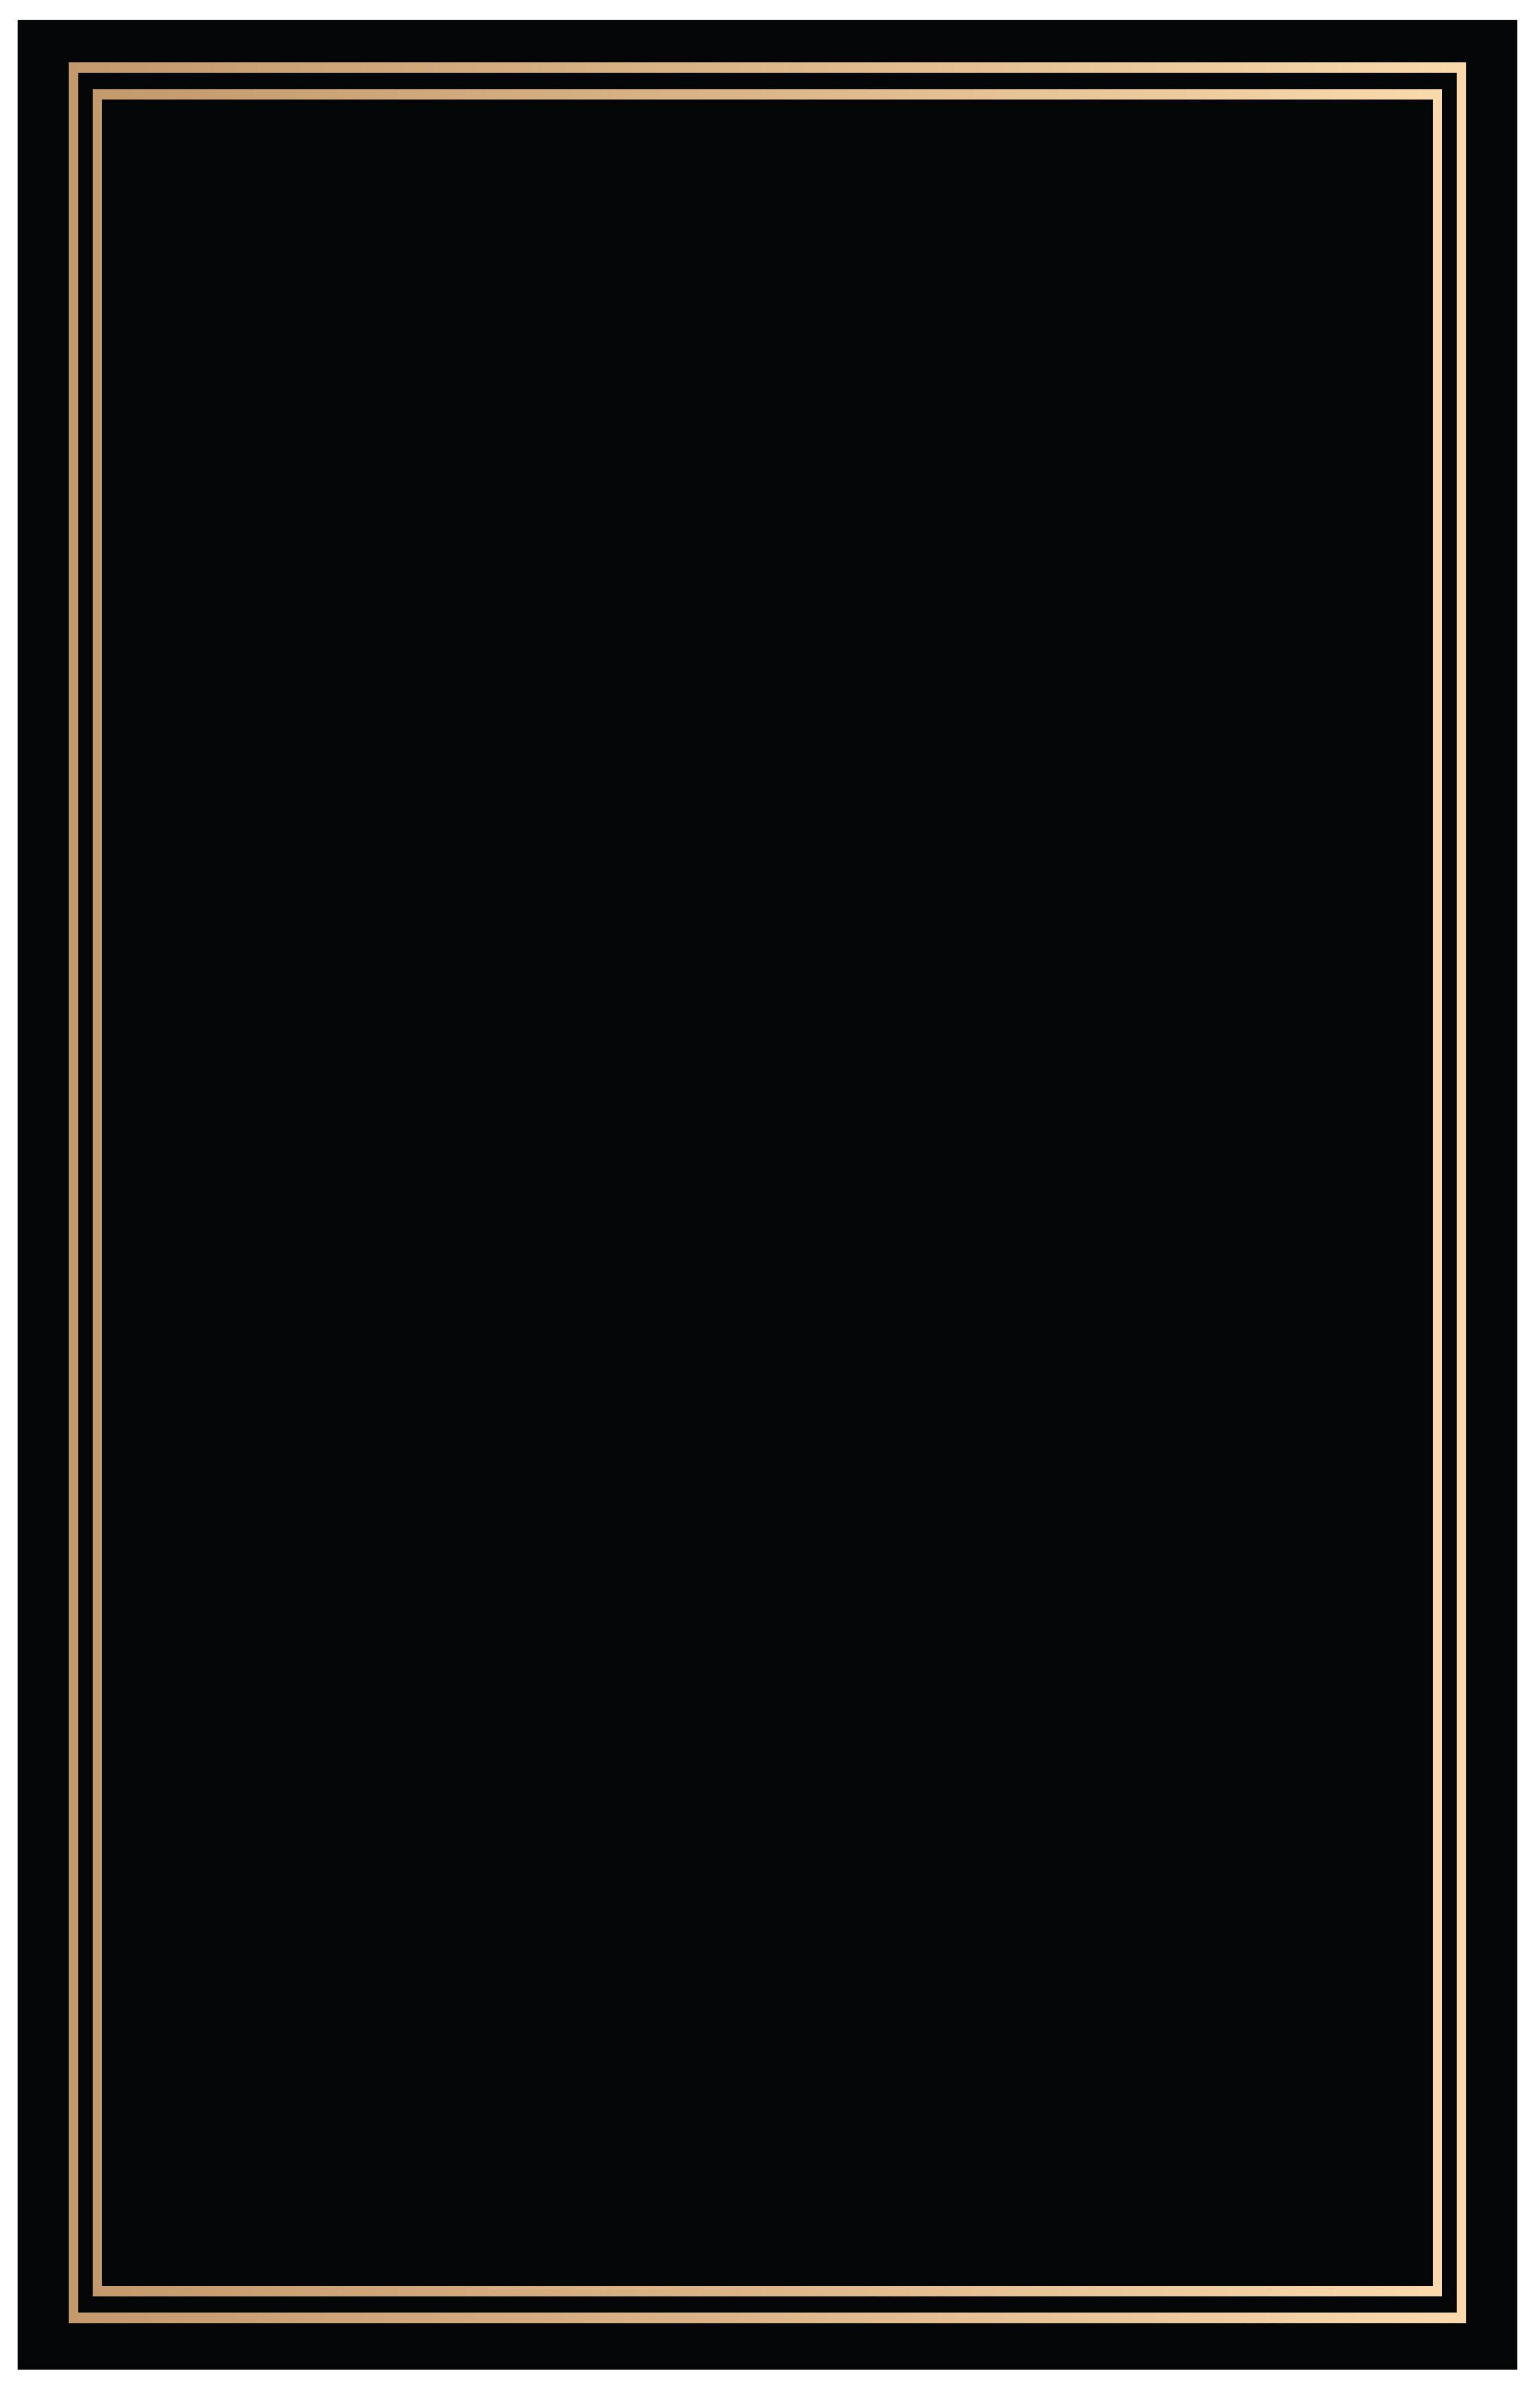 ppt 背景 背景图片 边框 模板 设计 相框 2739_4251 竖版 竖屏